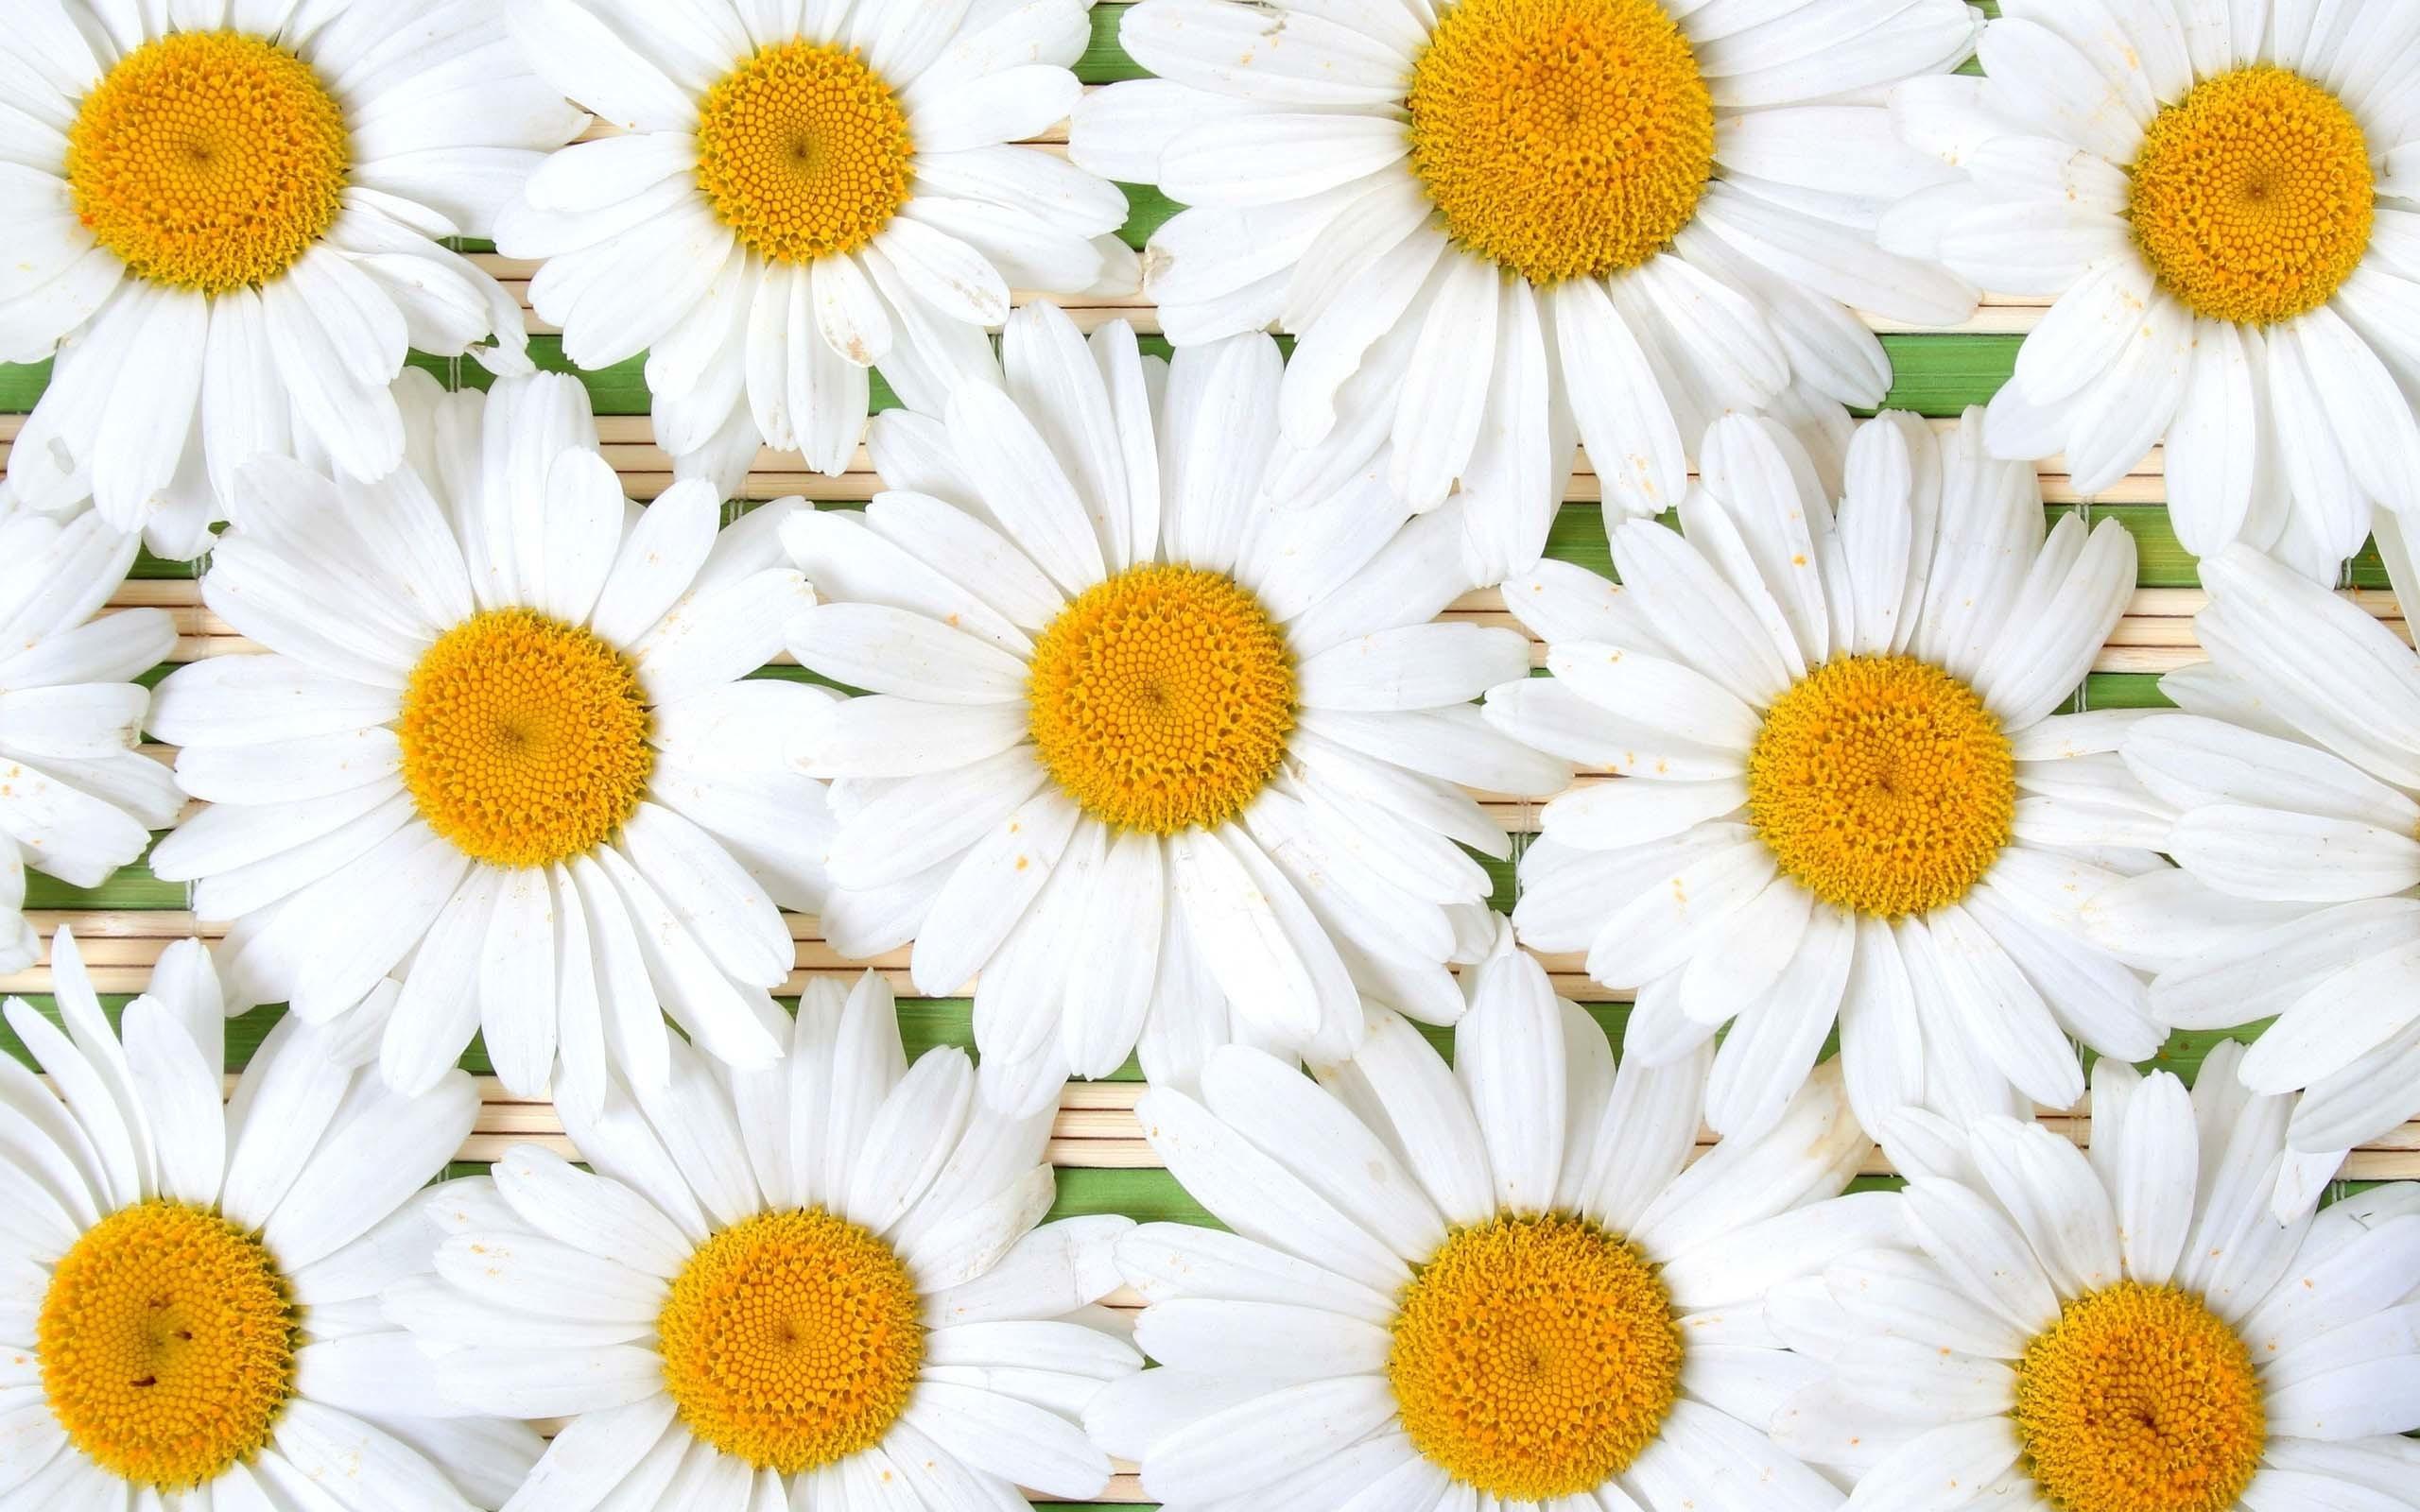 Daisy Flower Wallpaper 57 Images